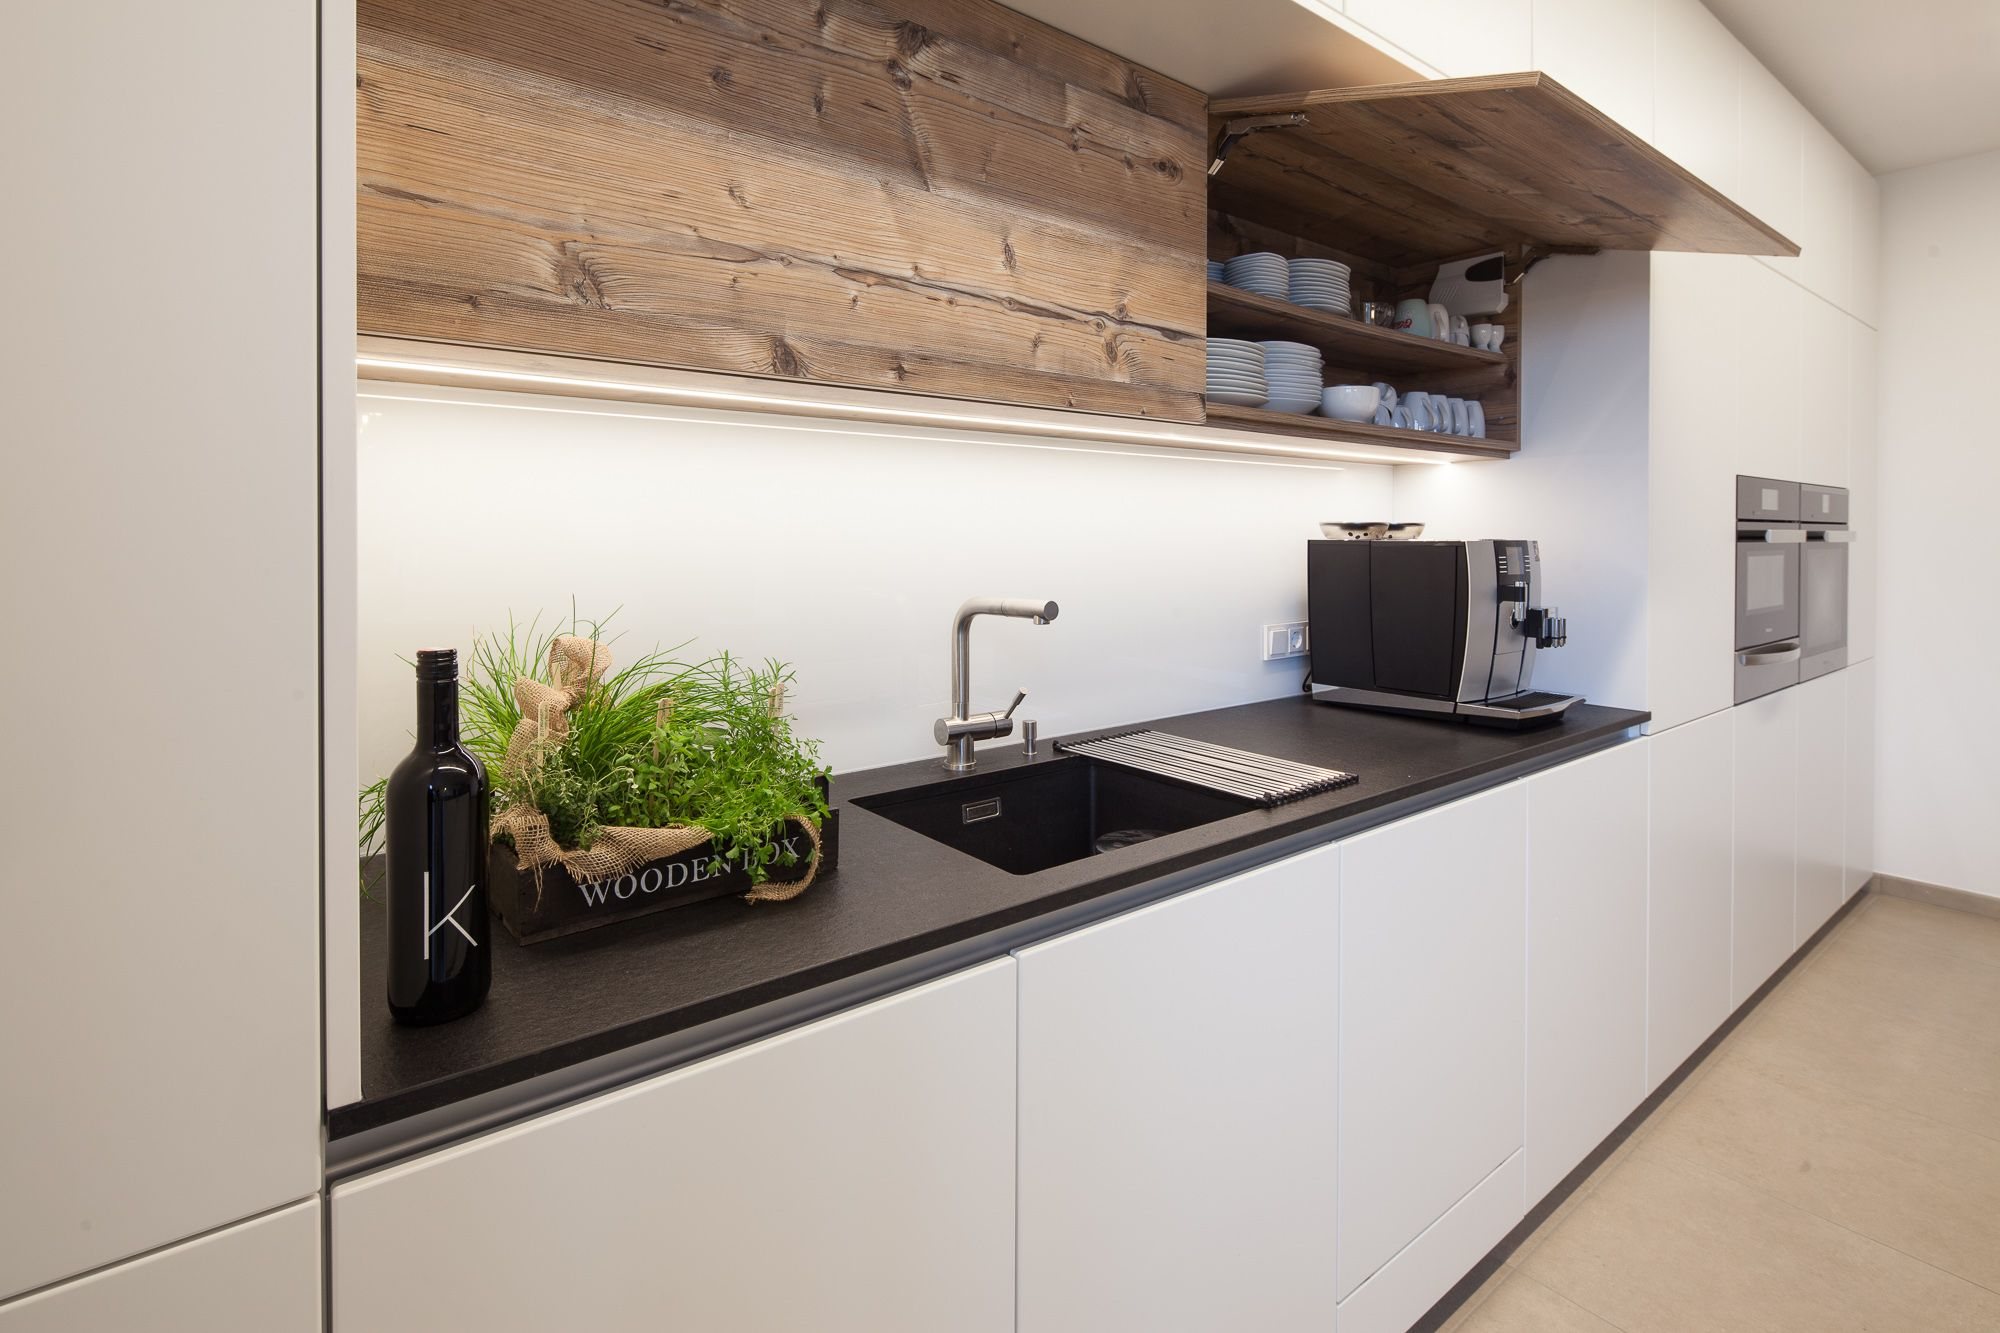 Krumhuber Design Kuche Kp Kuchen Design Kuche Holzboden Moderne Kuche